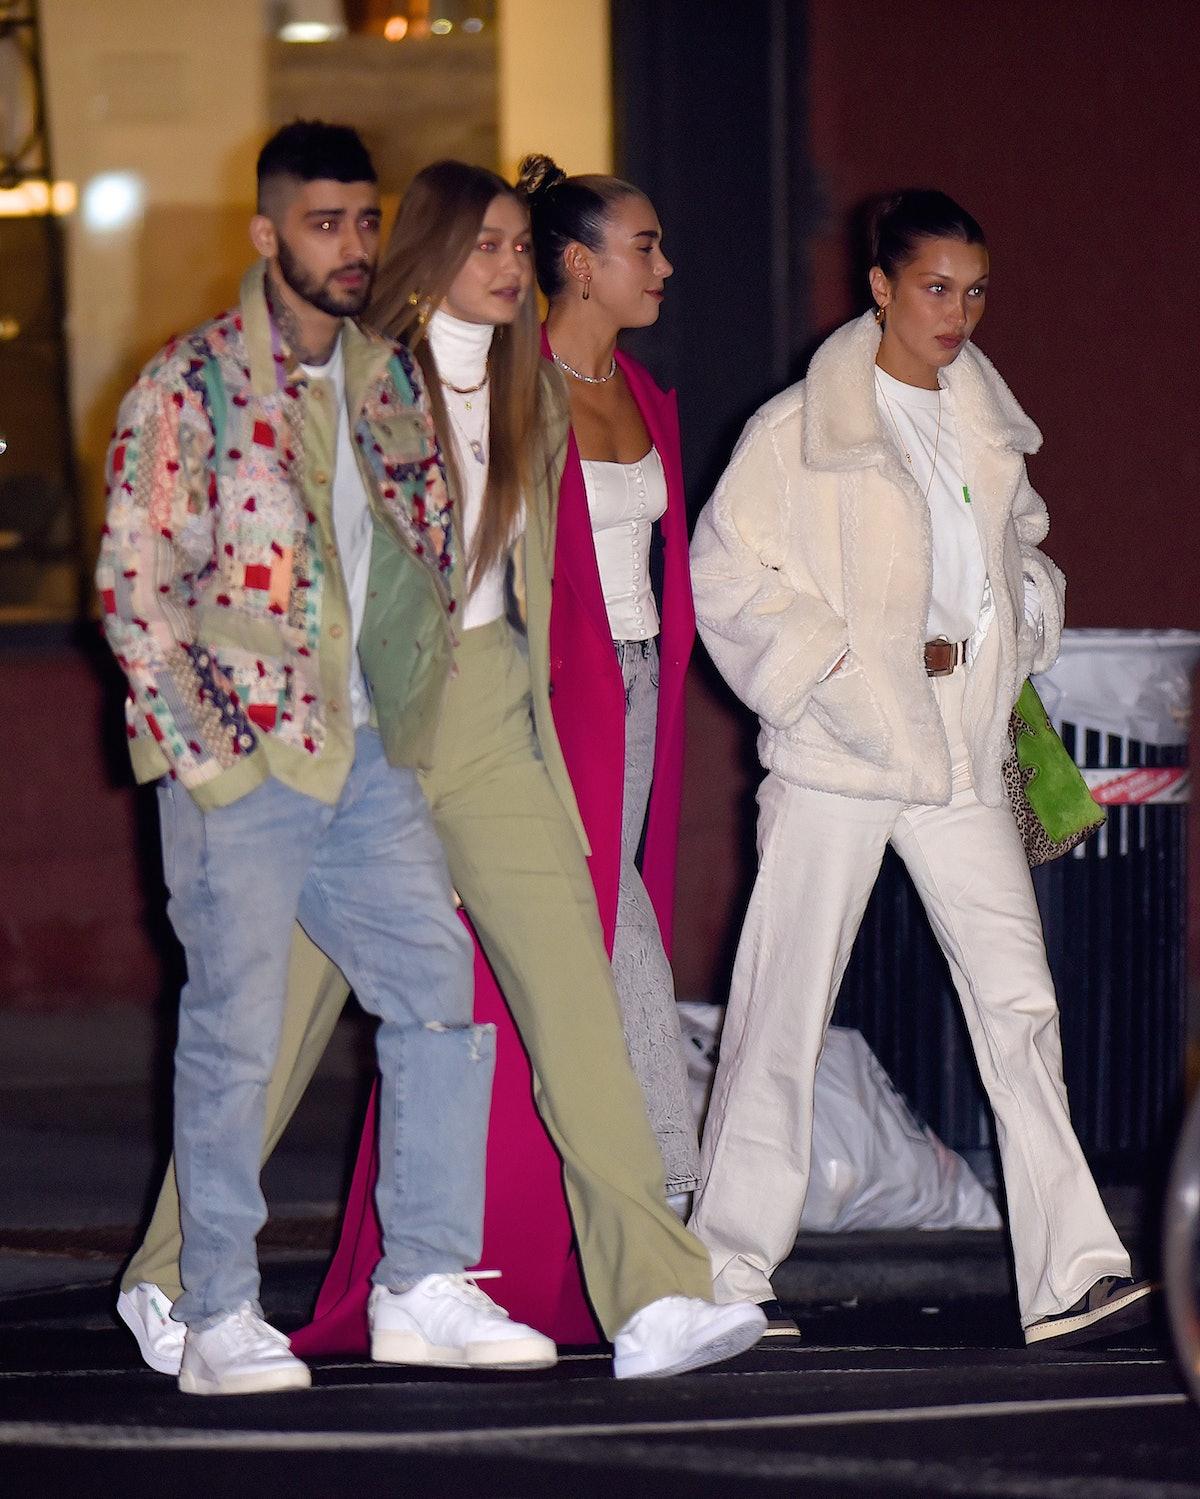 NEW YORK, NY - JANUARY 11:  Gigi Hadid, with Zayn Malik and Bella hadid and Dua Lipa seen out celebrating a birthday in Manhattan on  January 11, 2020 in New York City.  (Photo by Robert Kamau/GC Images)